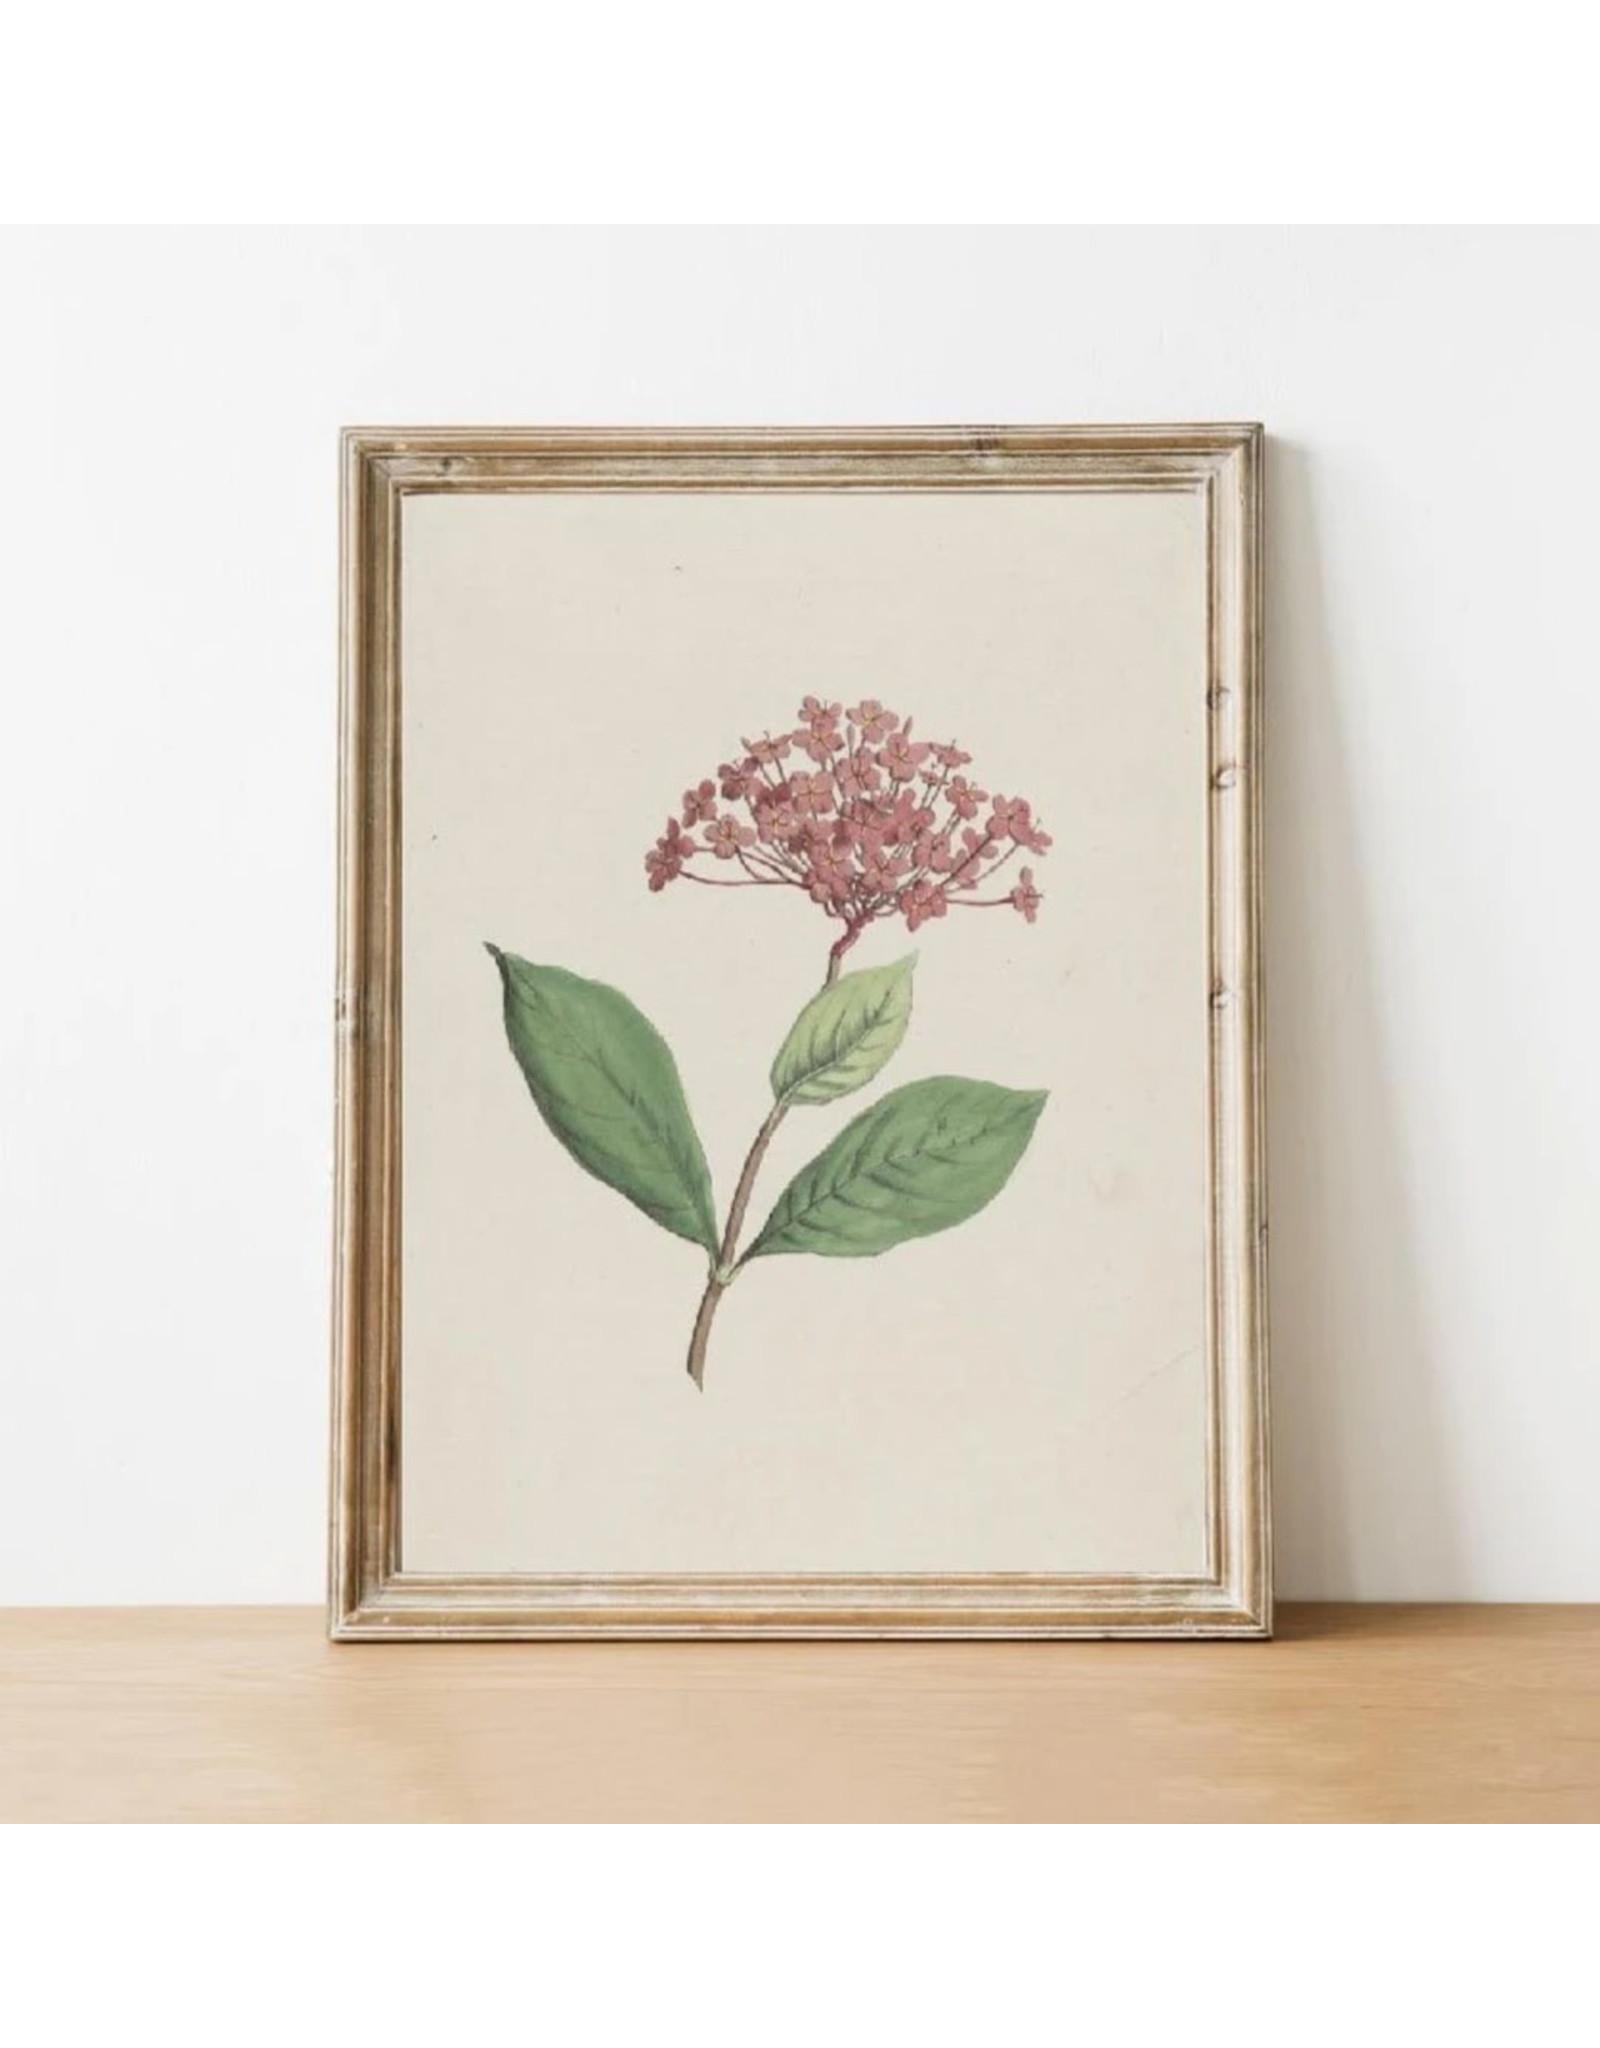 Vintage Print - Flower